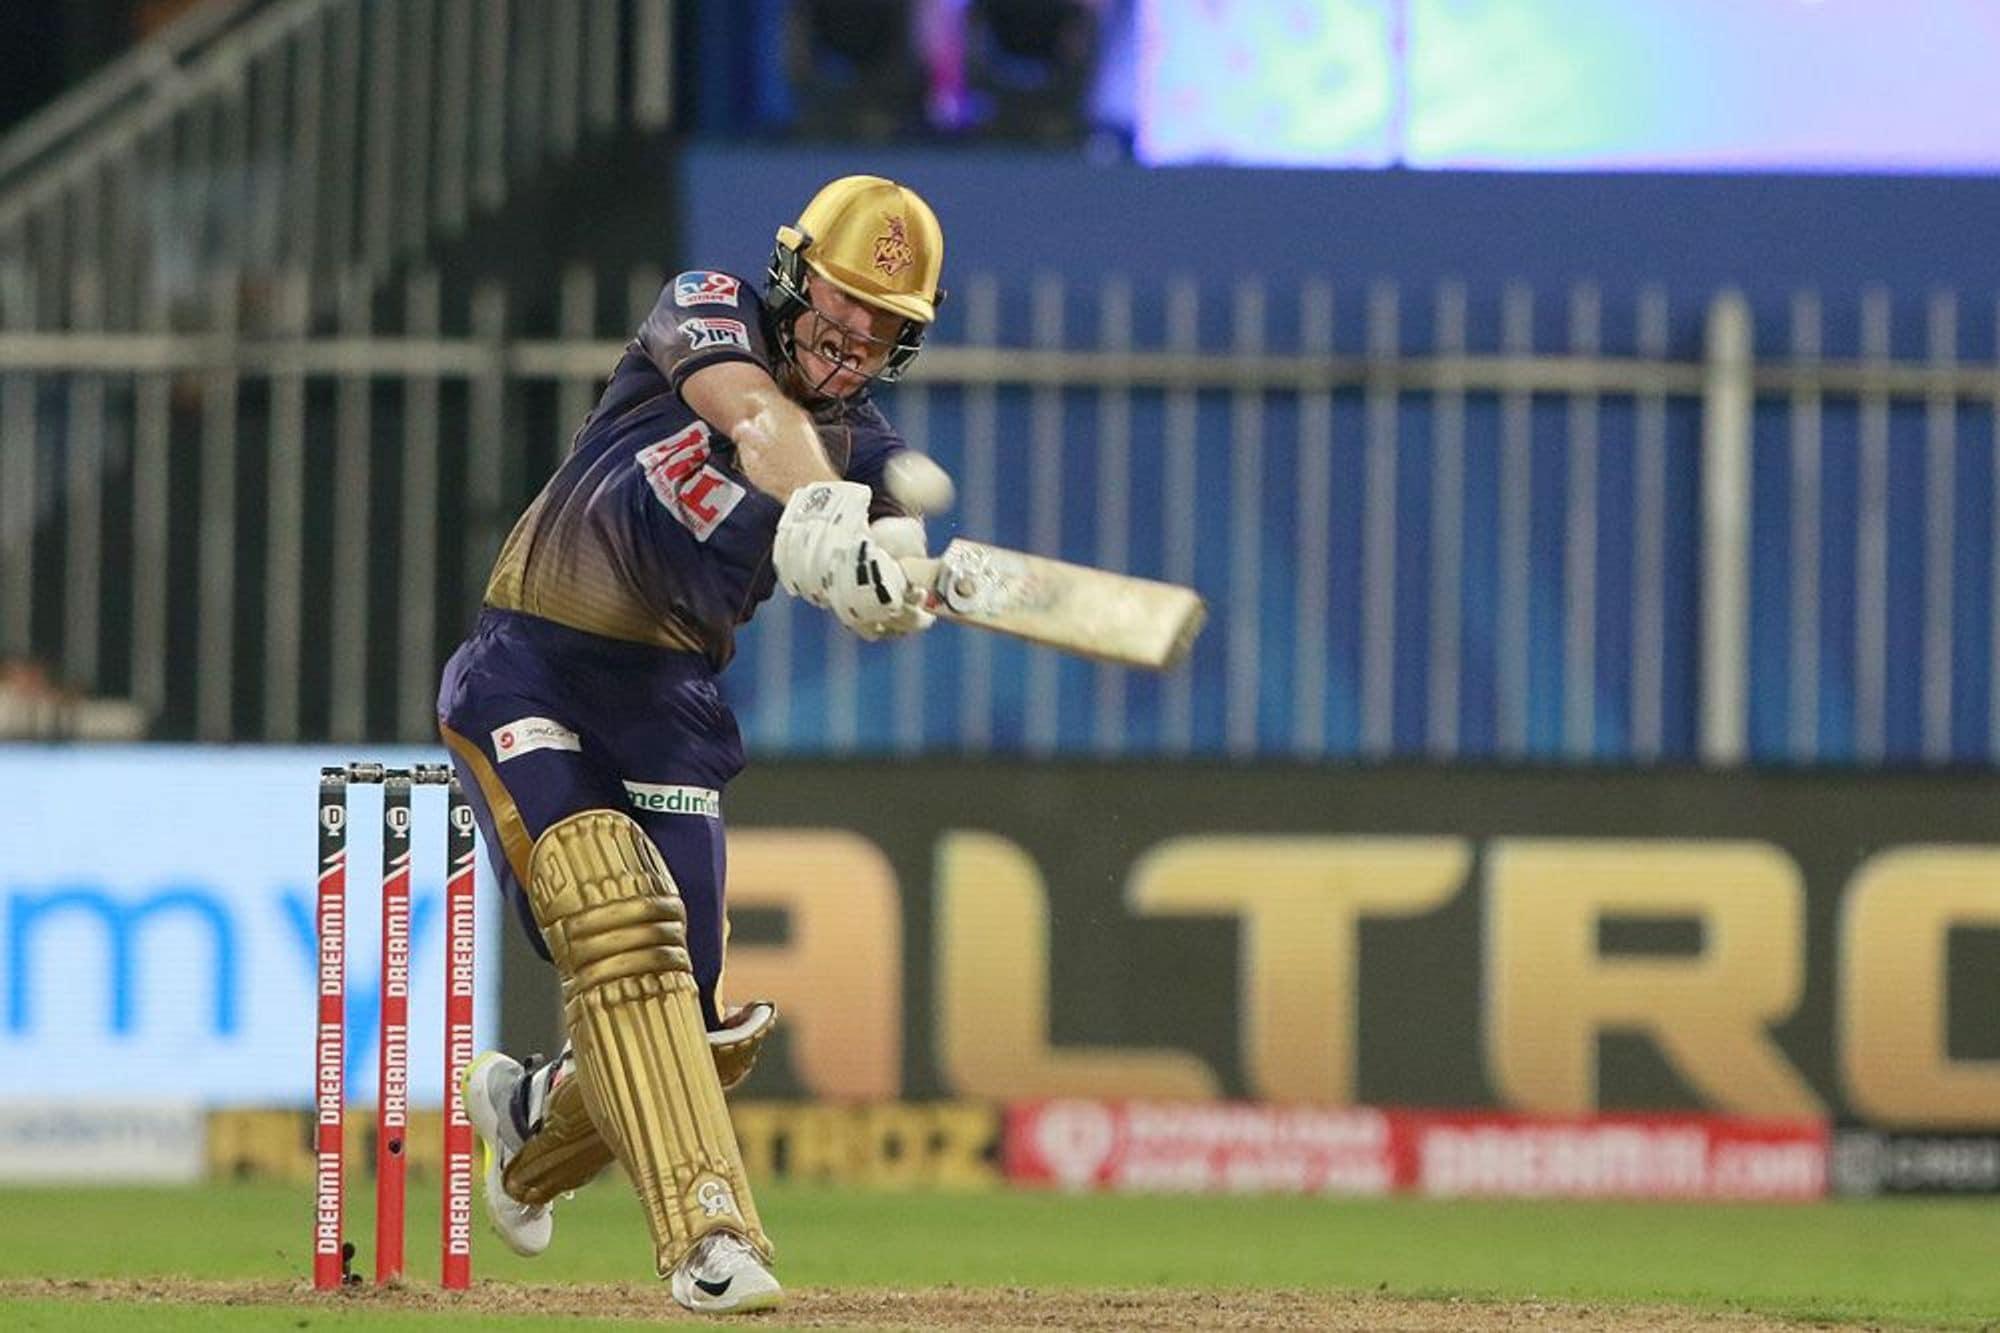 IPL 2020:Not Dinesh Karthik But Eoin Morgan Should be Leading Kolkata Knight Riders, Says S Sreesanth